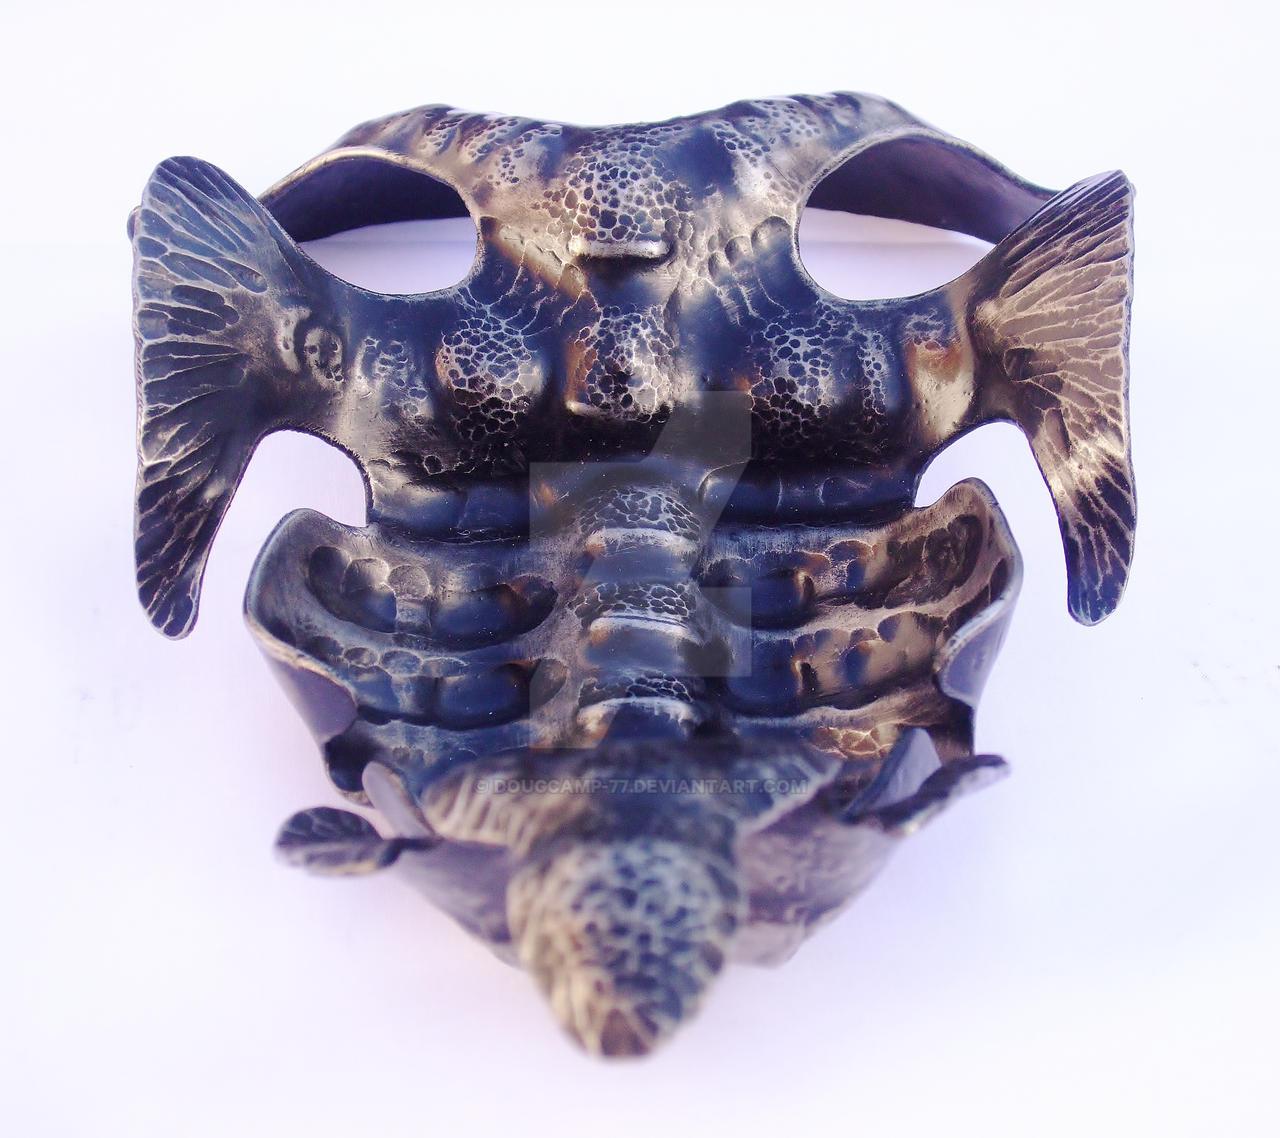 Organic deep sea organism vessel by DougCamp-77